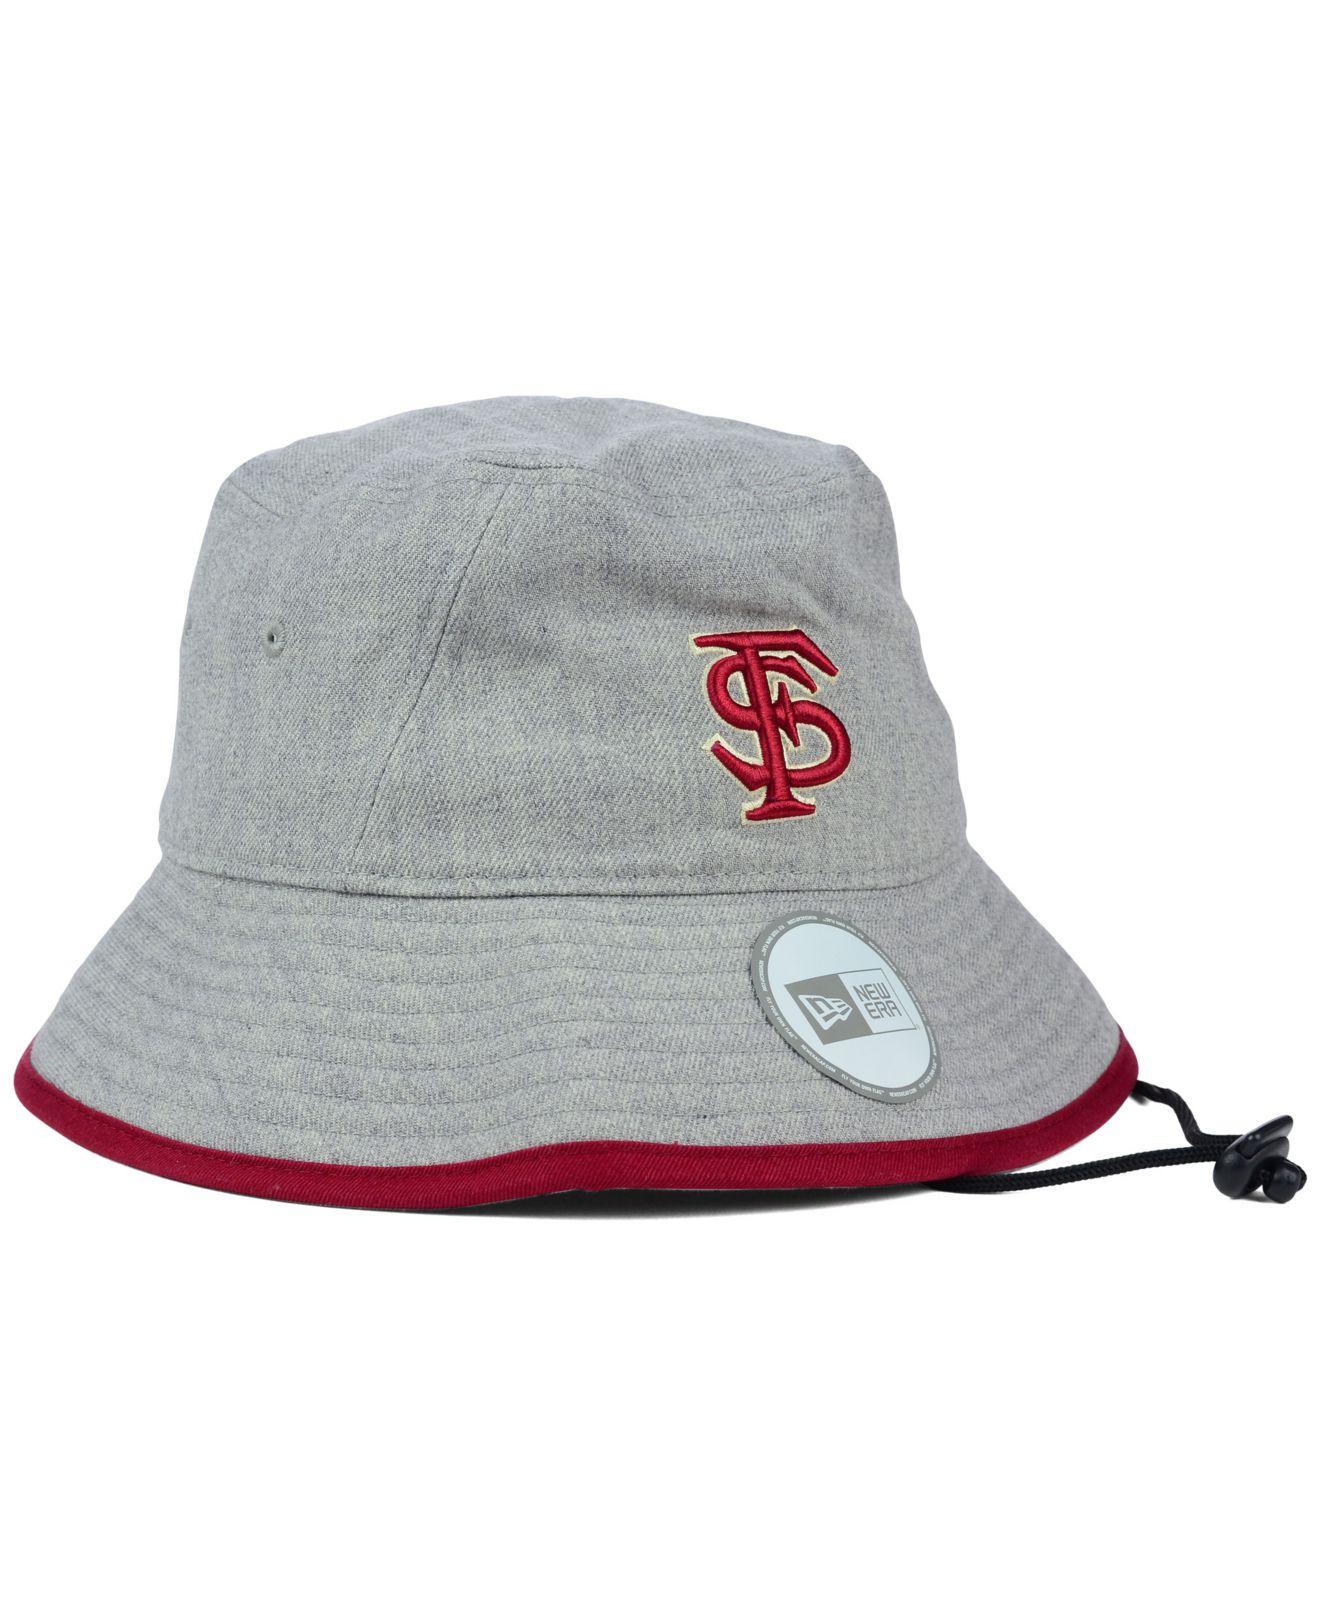 Lyst - KTZ Florida State Seminoles Tip Bucket Hat in Gray 8b4147b33f8